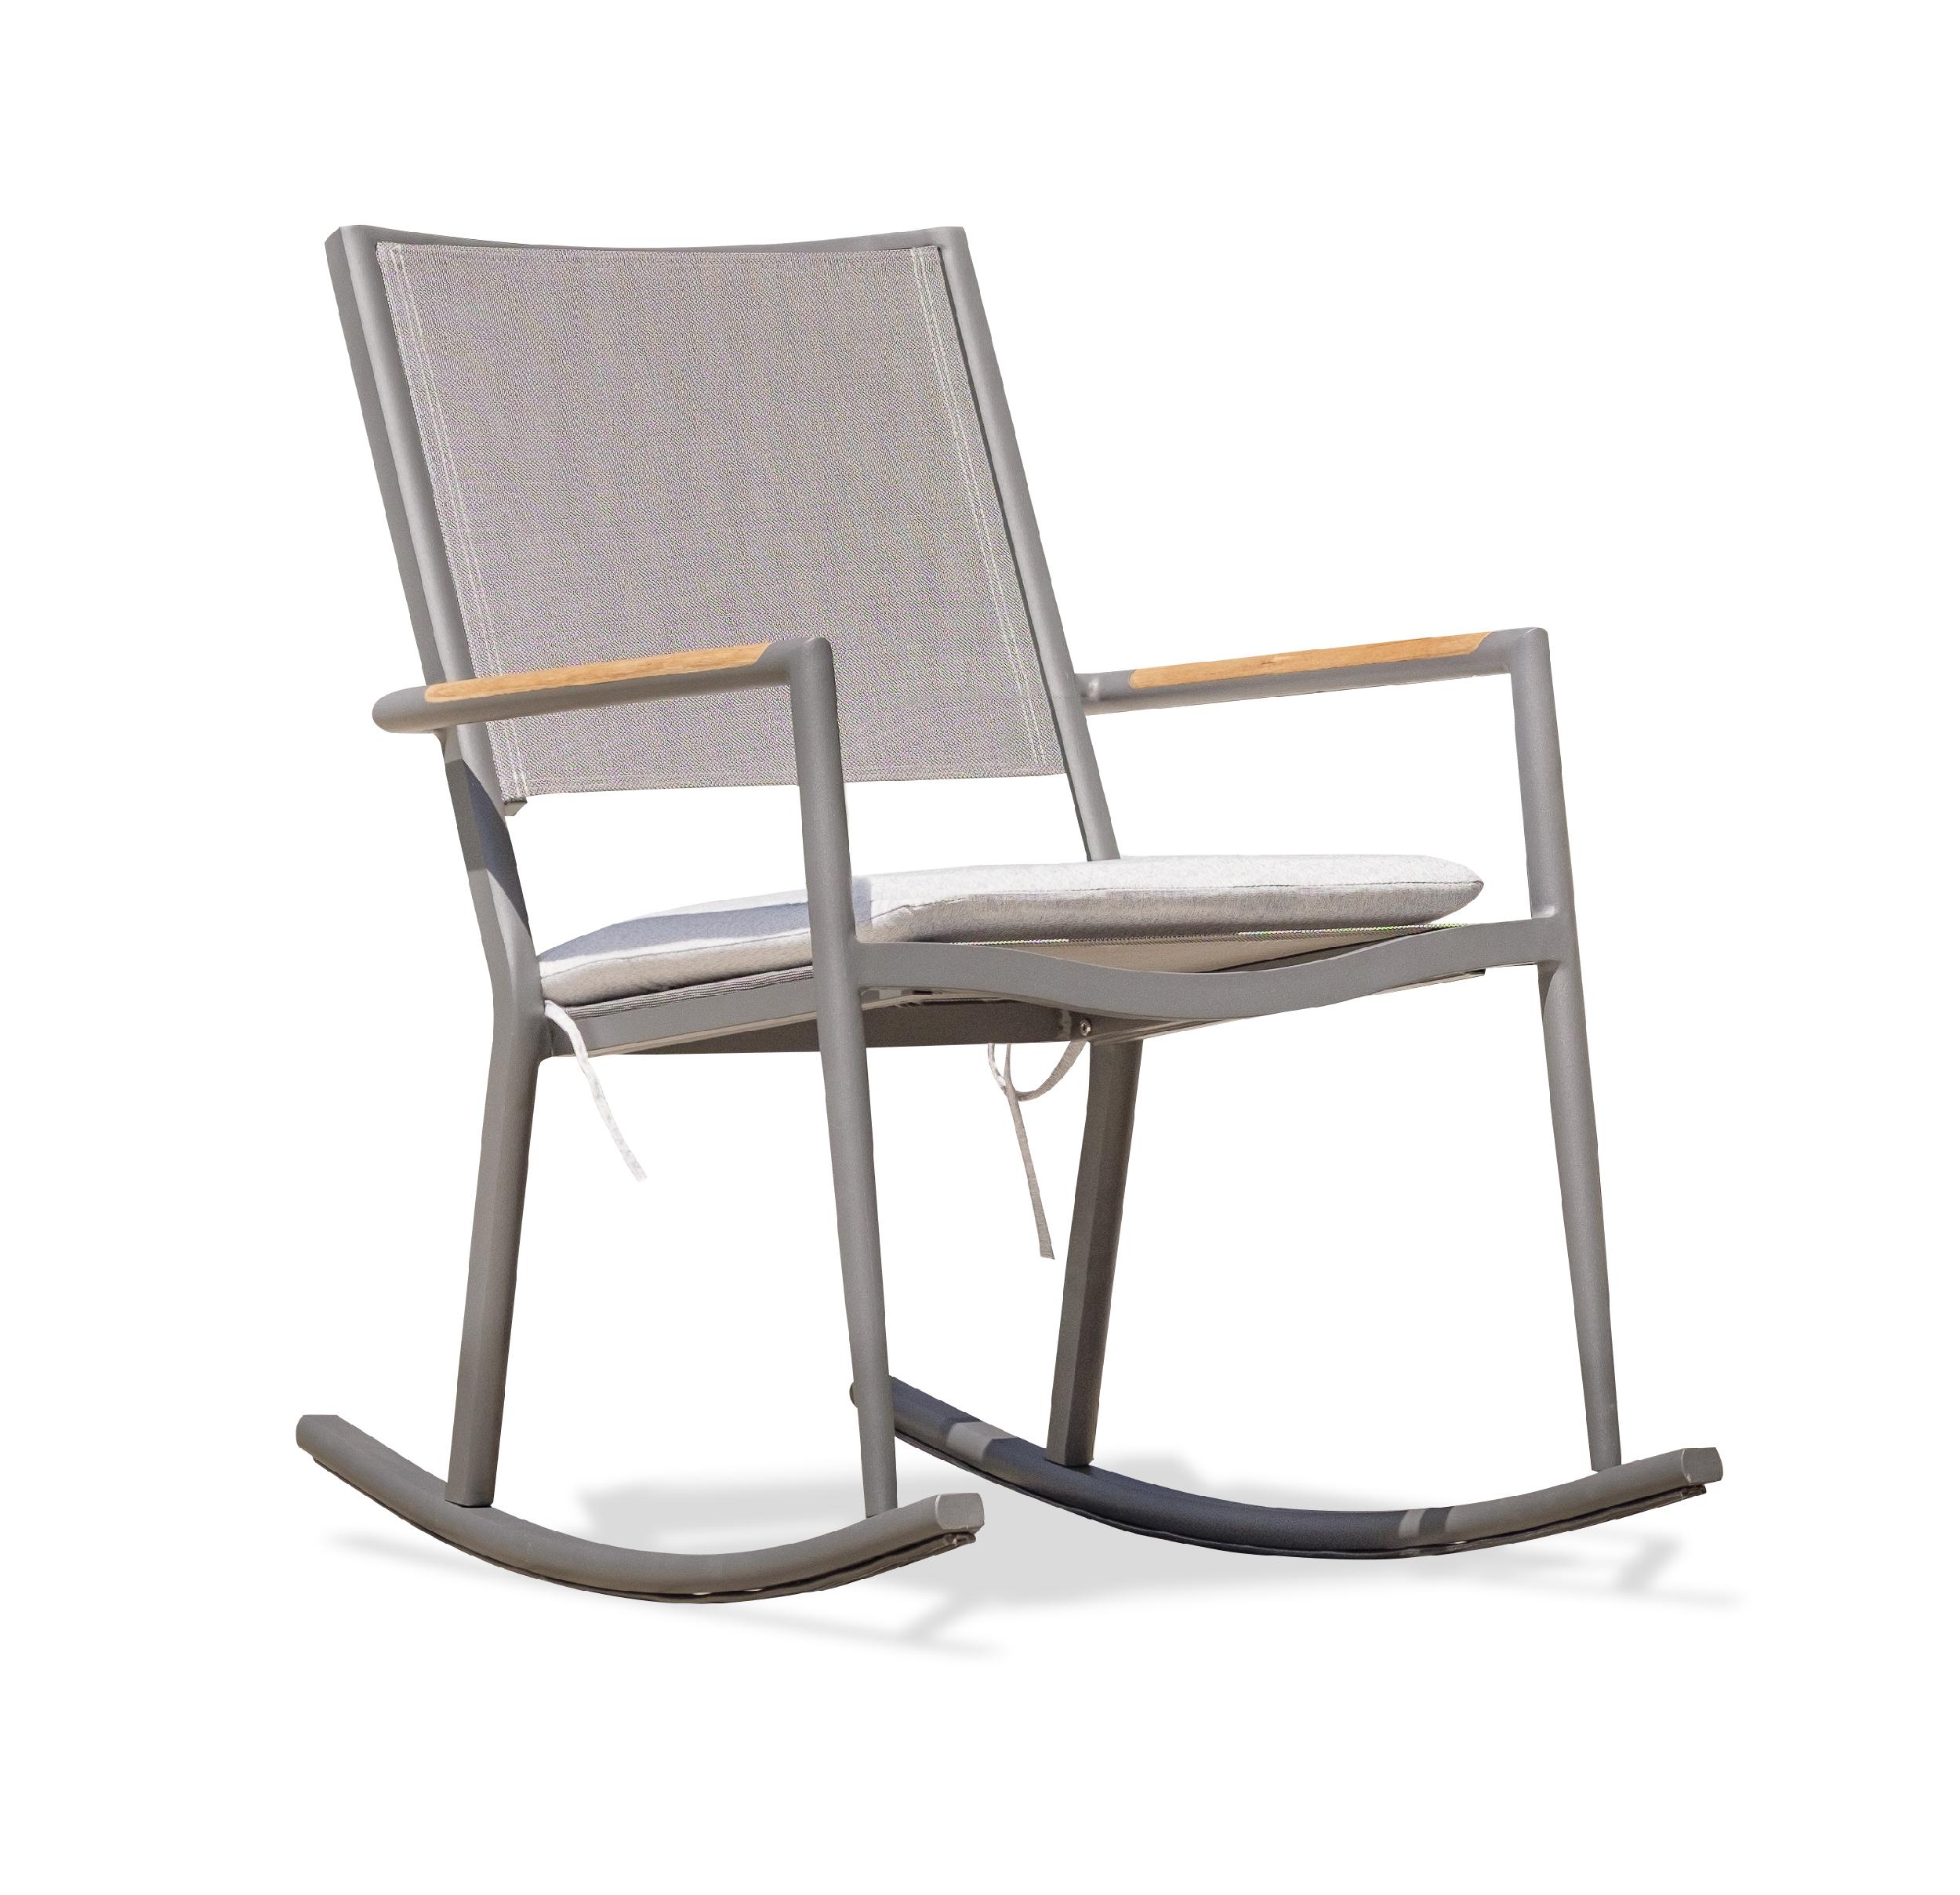 Rocking chair en toile plastifiée et aluminium gris anthracite